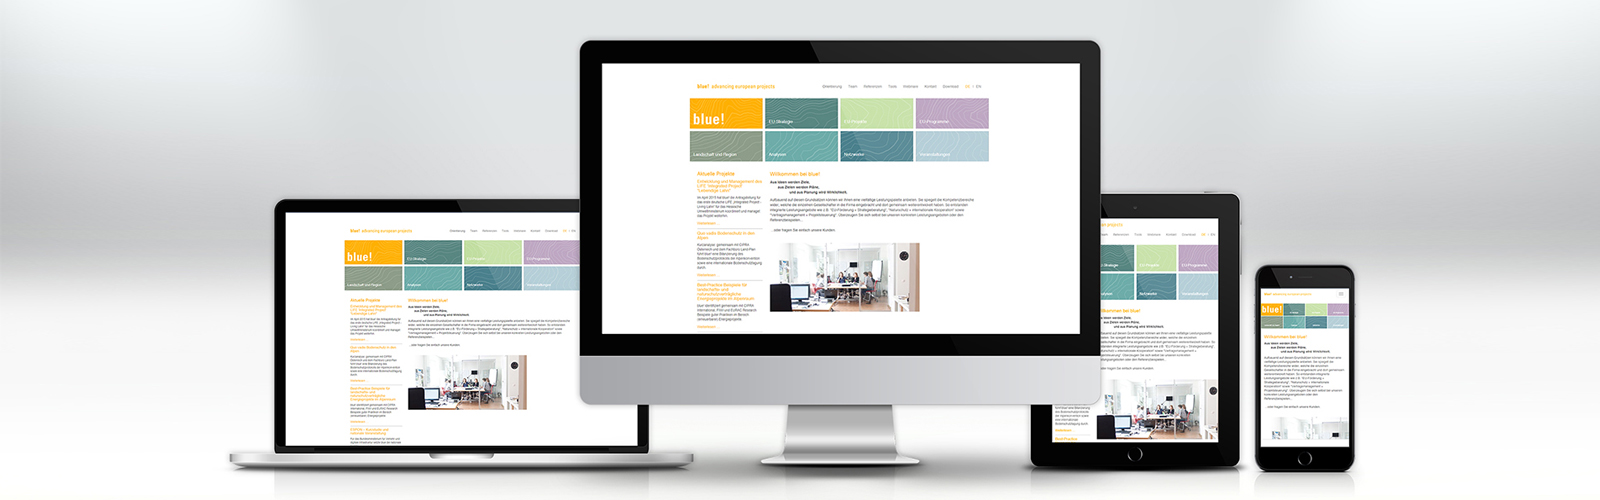 webdesign sulzbach-rosenberg mehrsprachig news-system